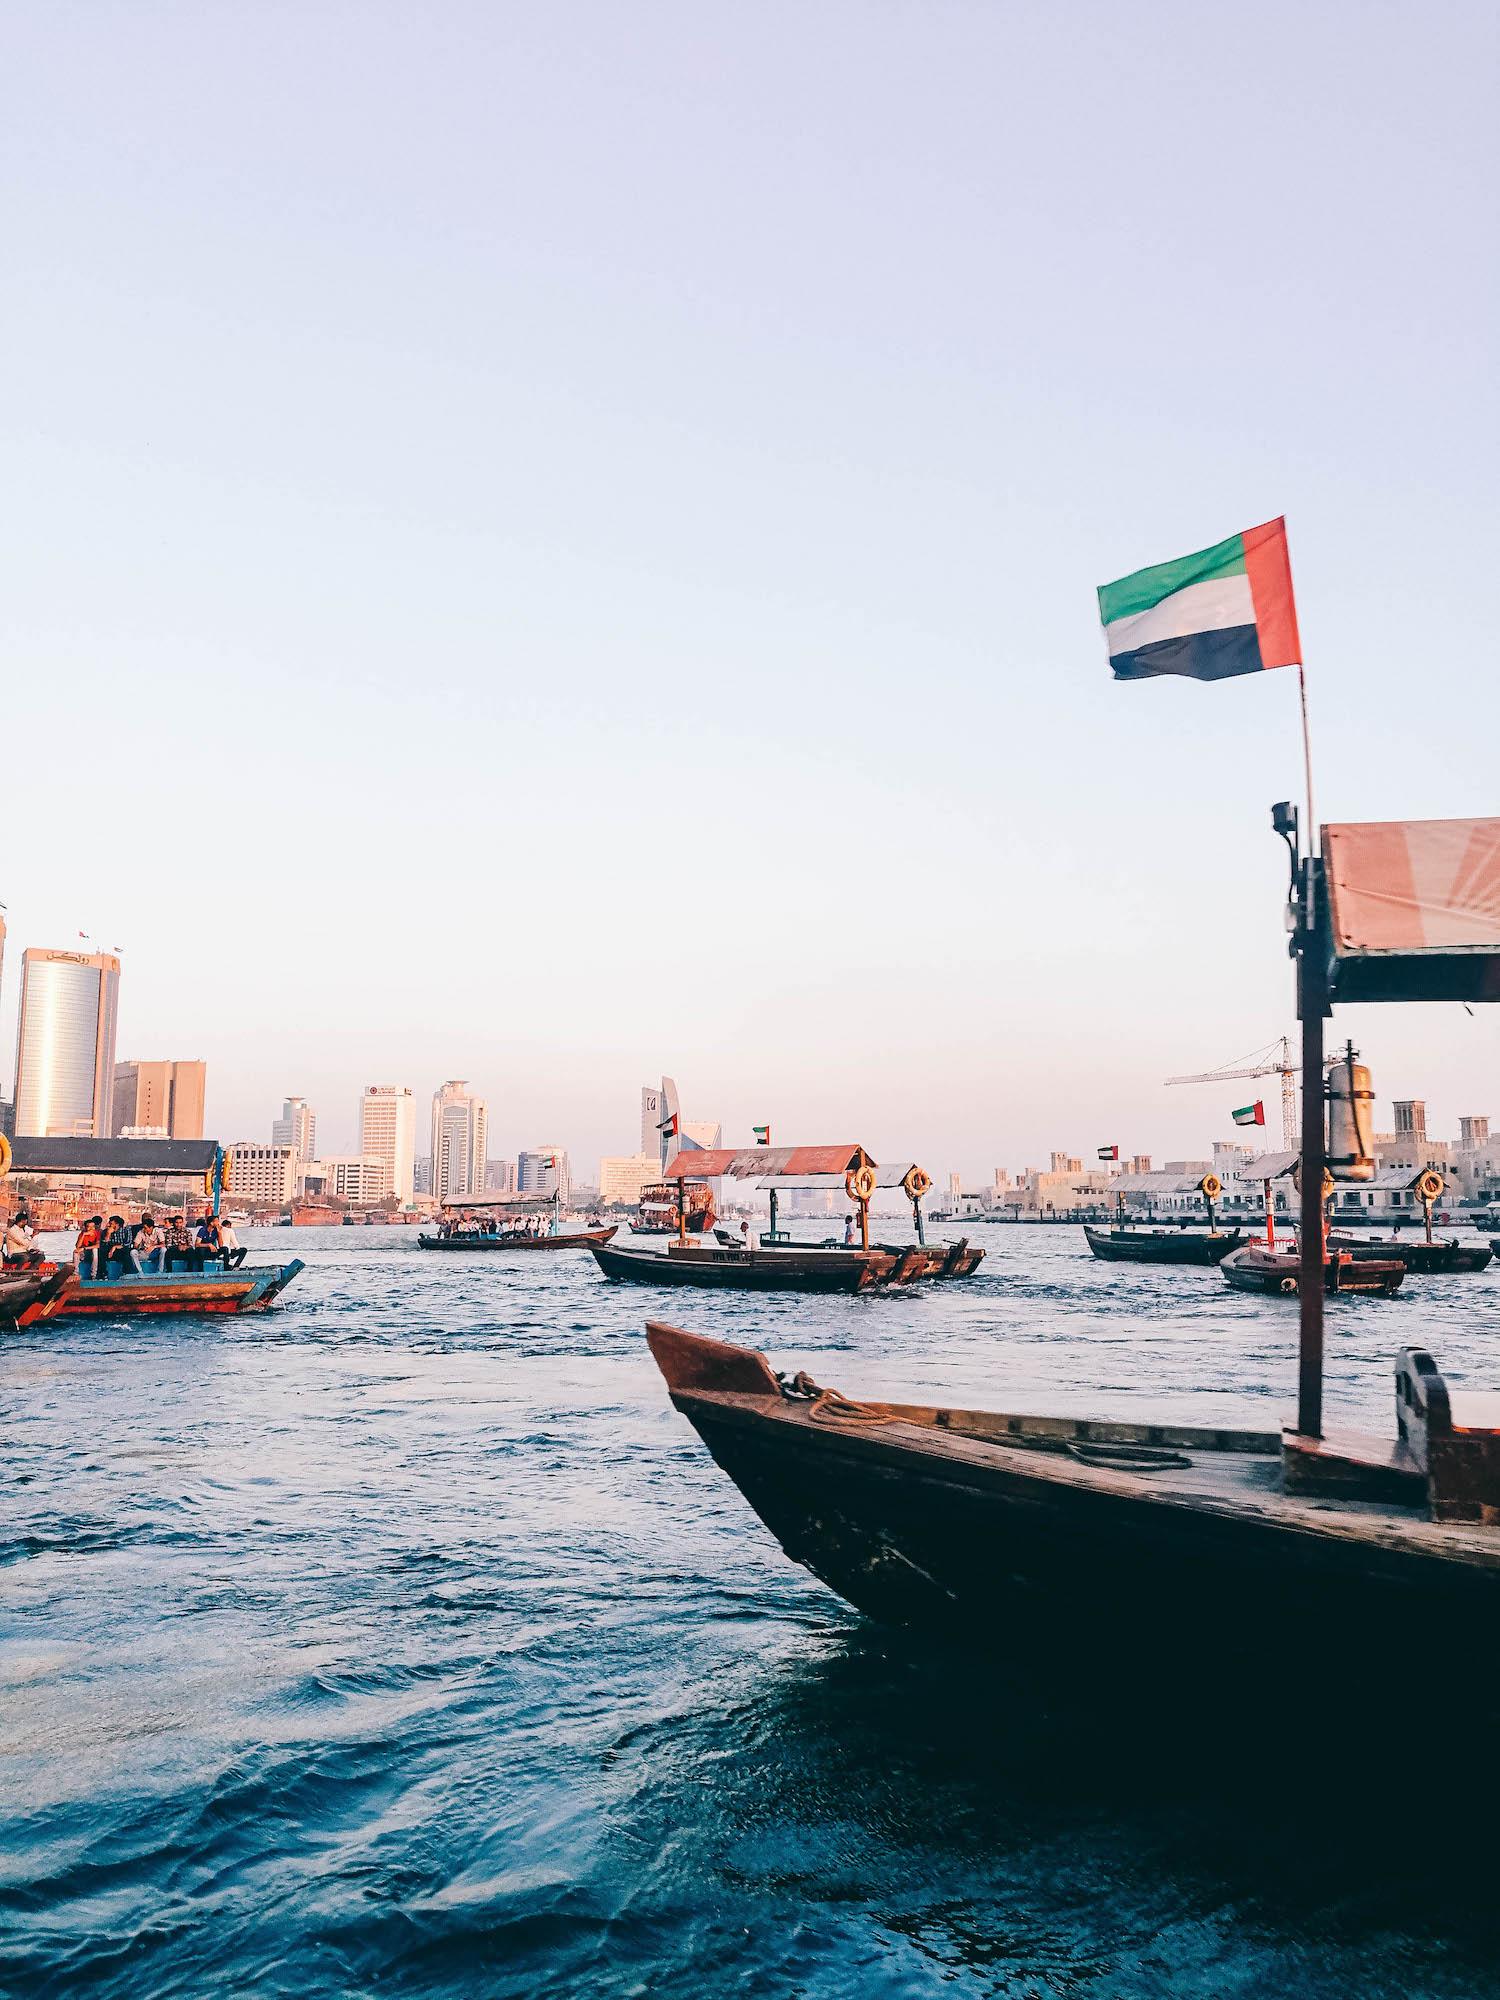 Dubai Old Souk, Creekside